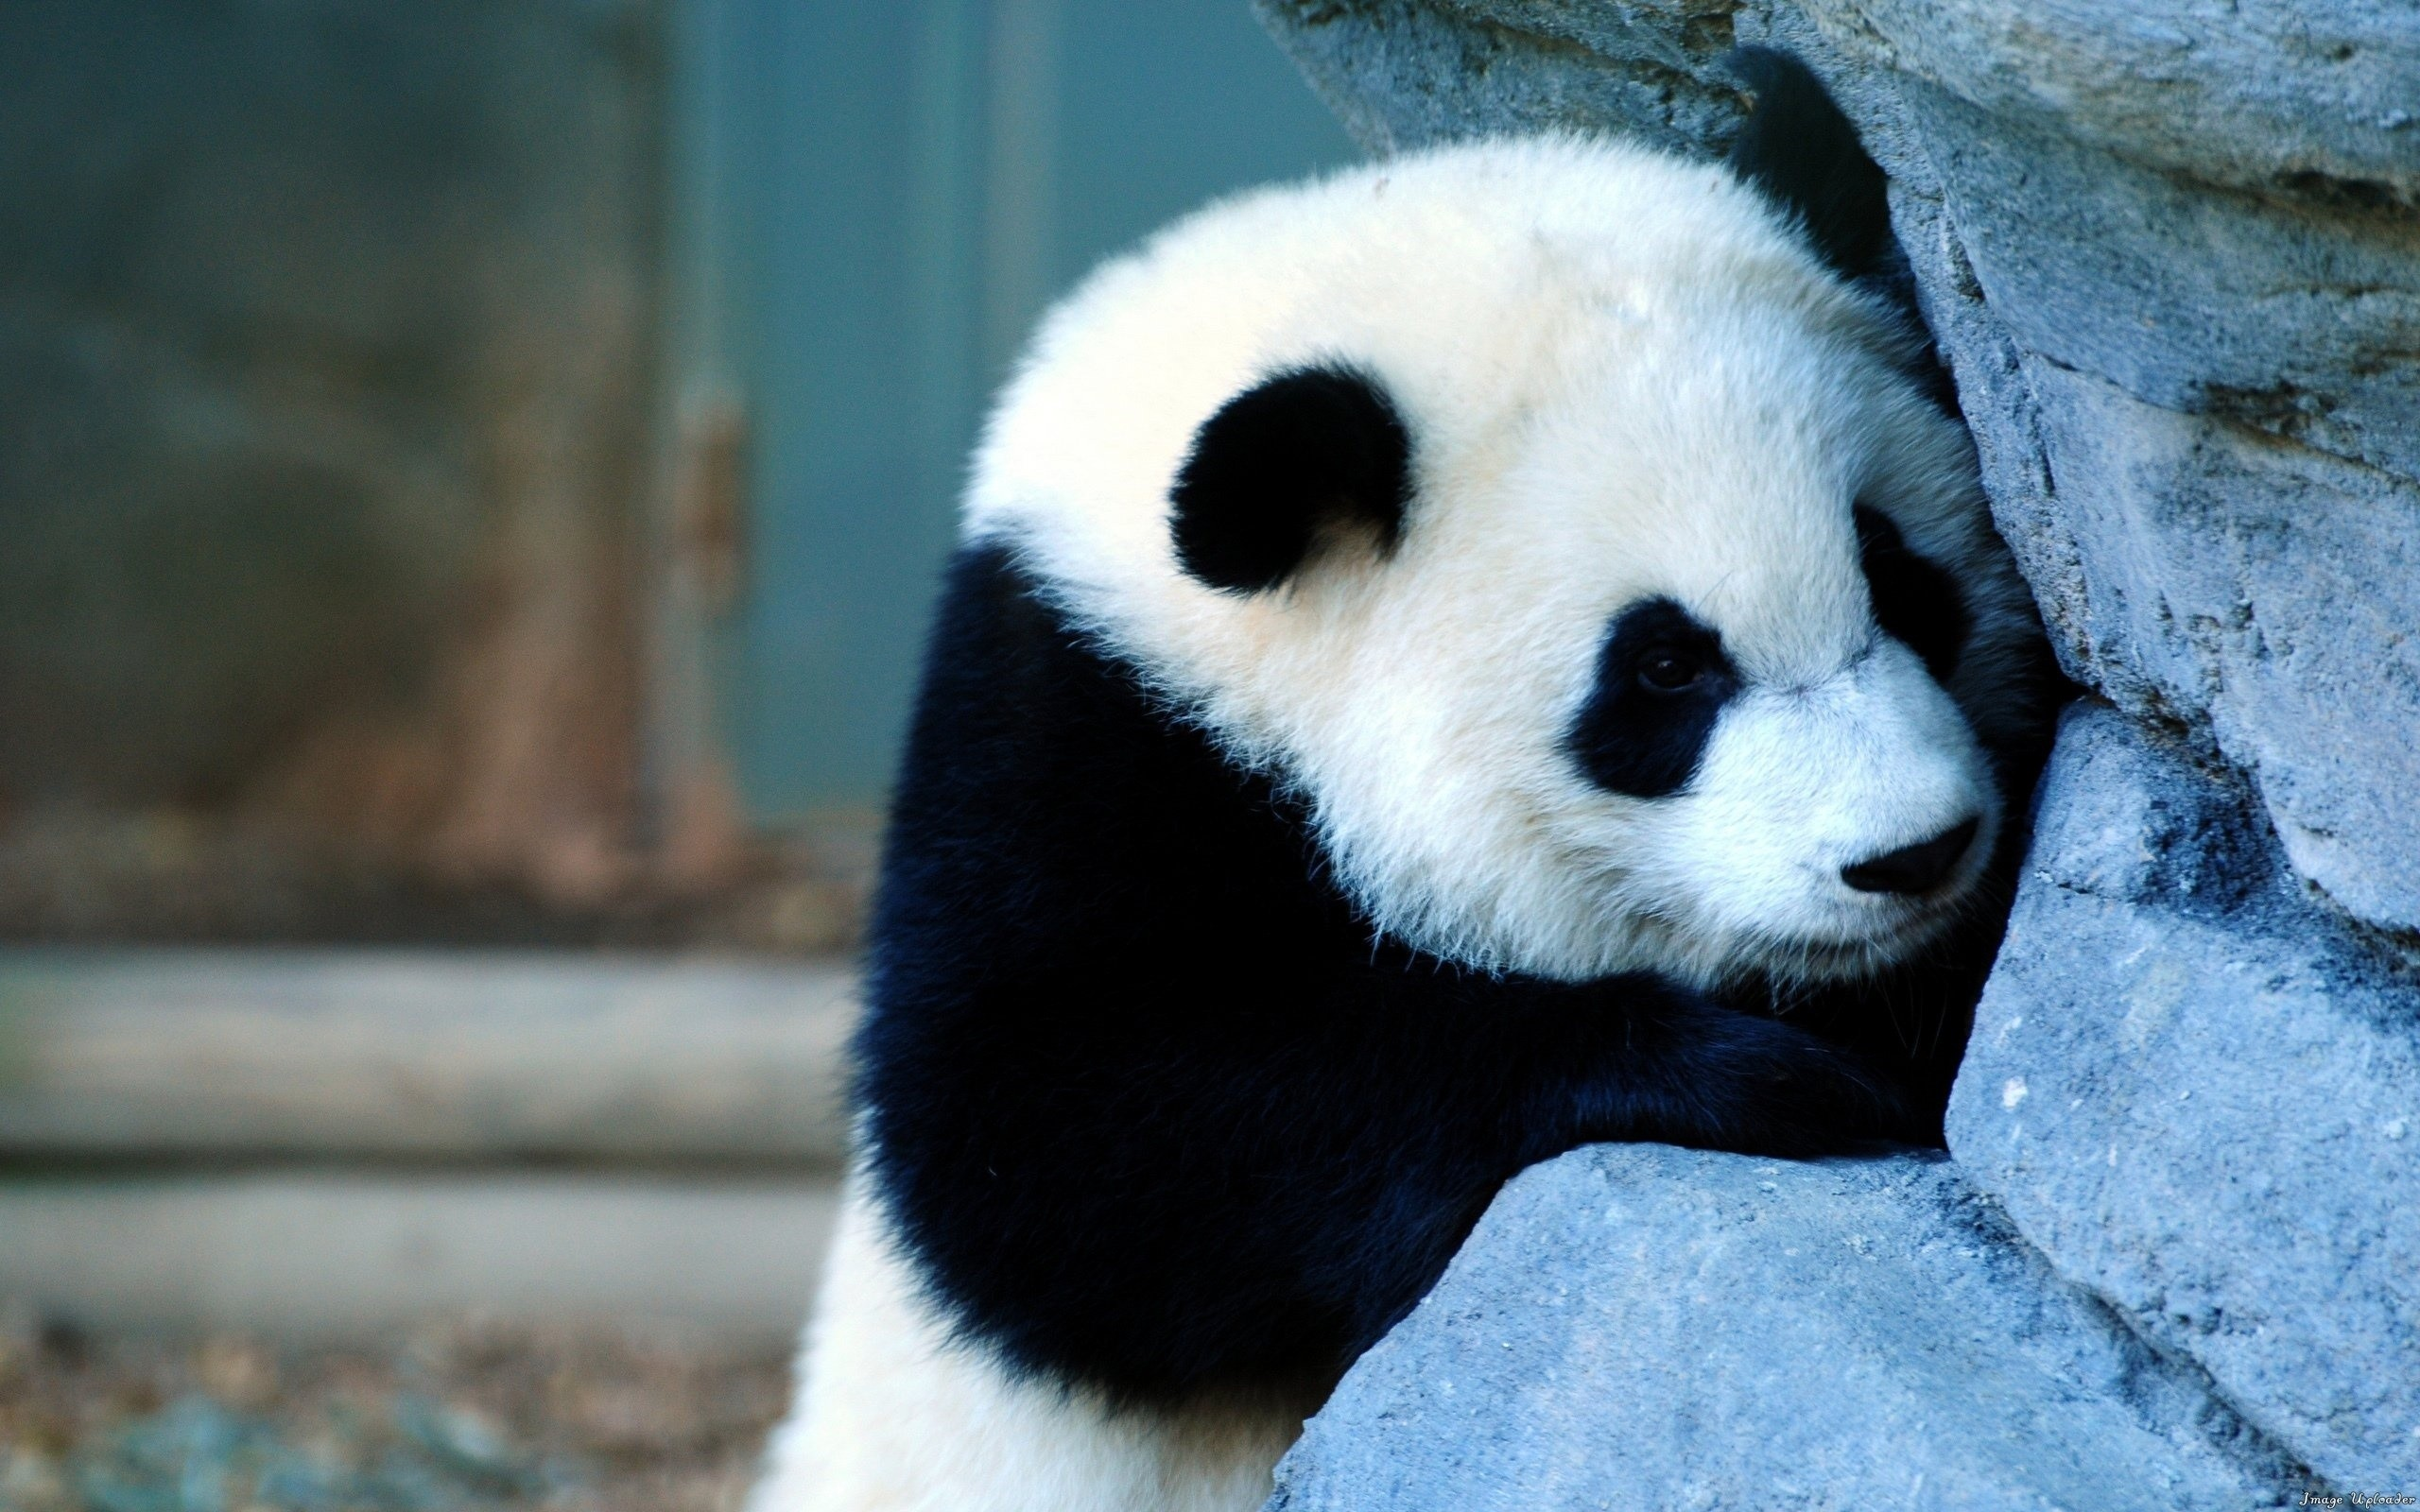 Cute Panda Photos Wallpaper | wallpapers55.com – Best Wallpapers for .